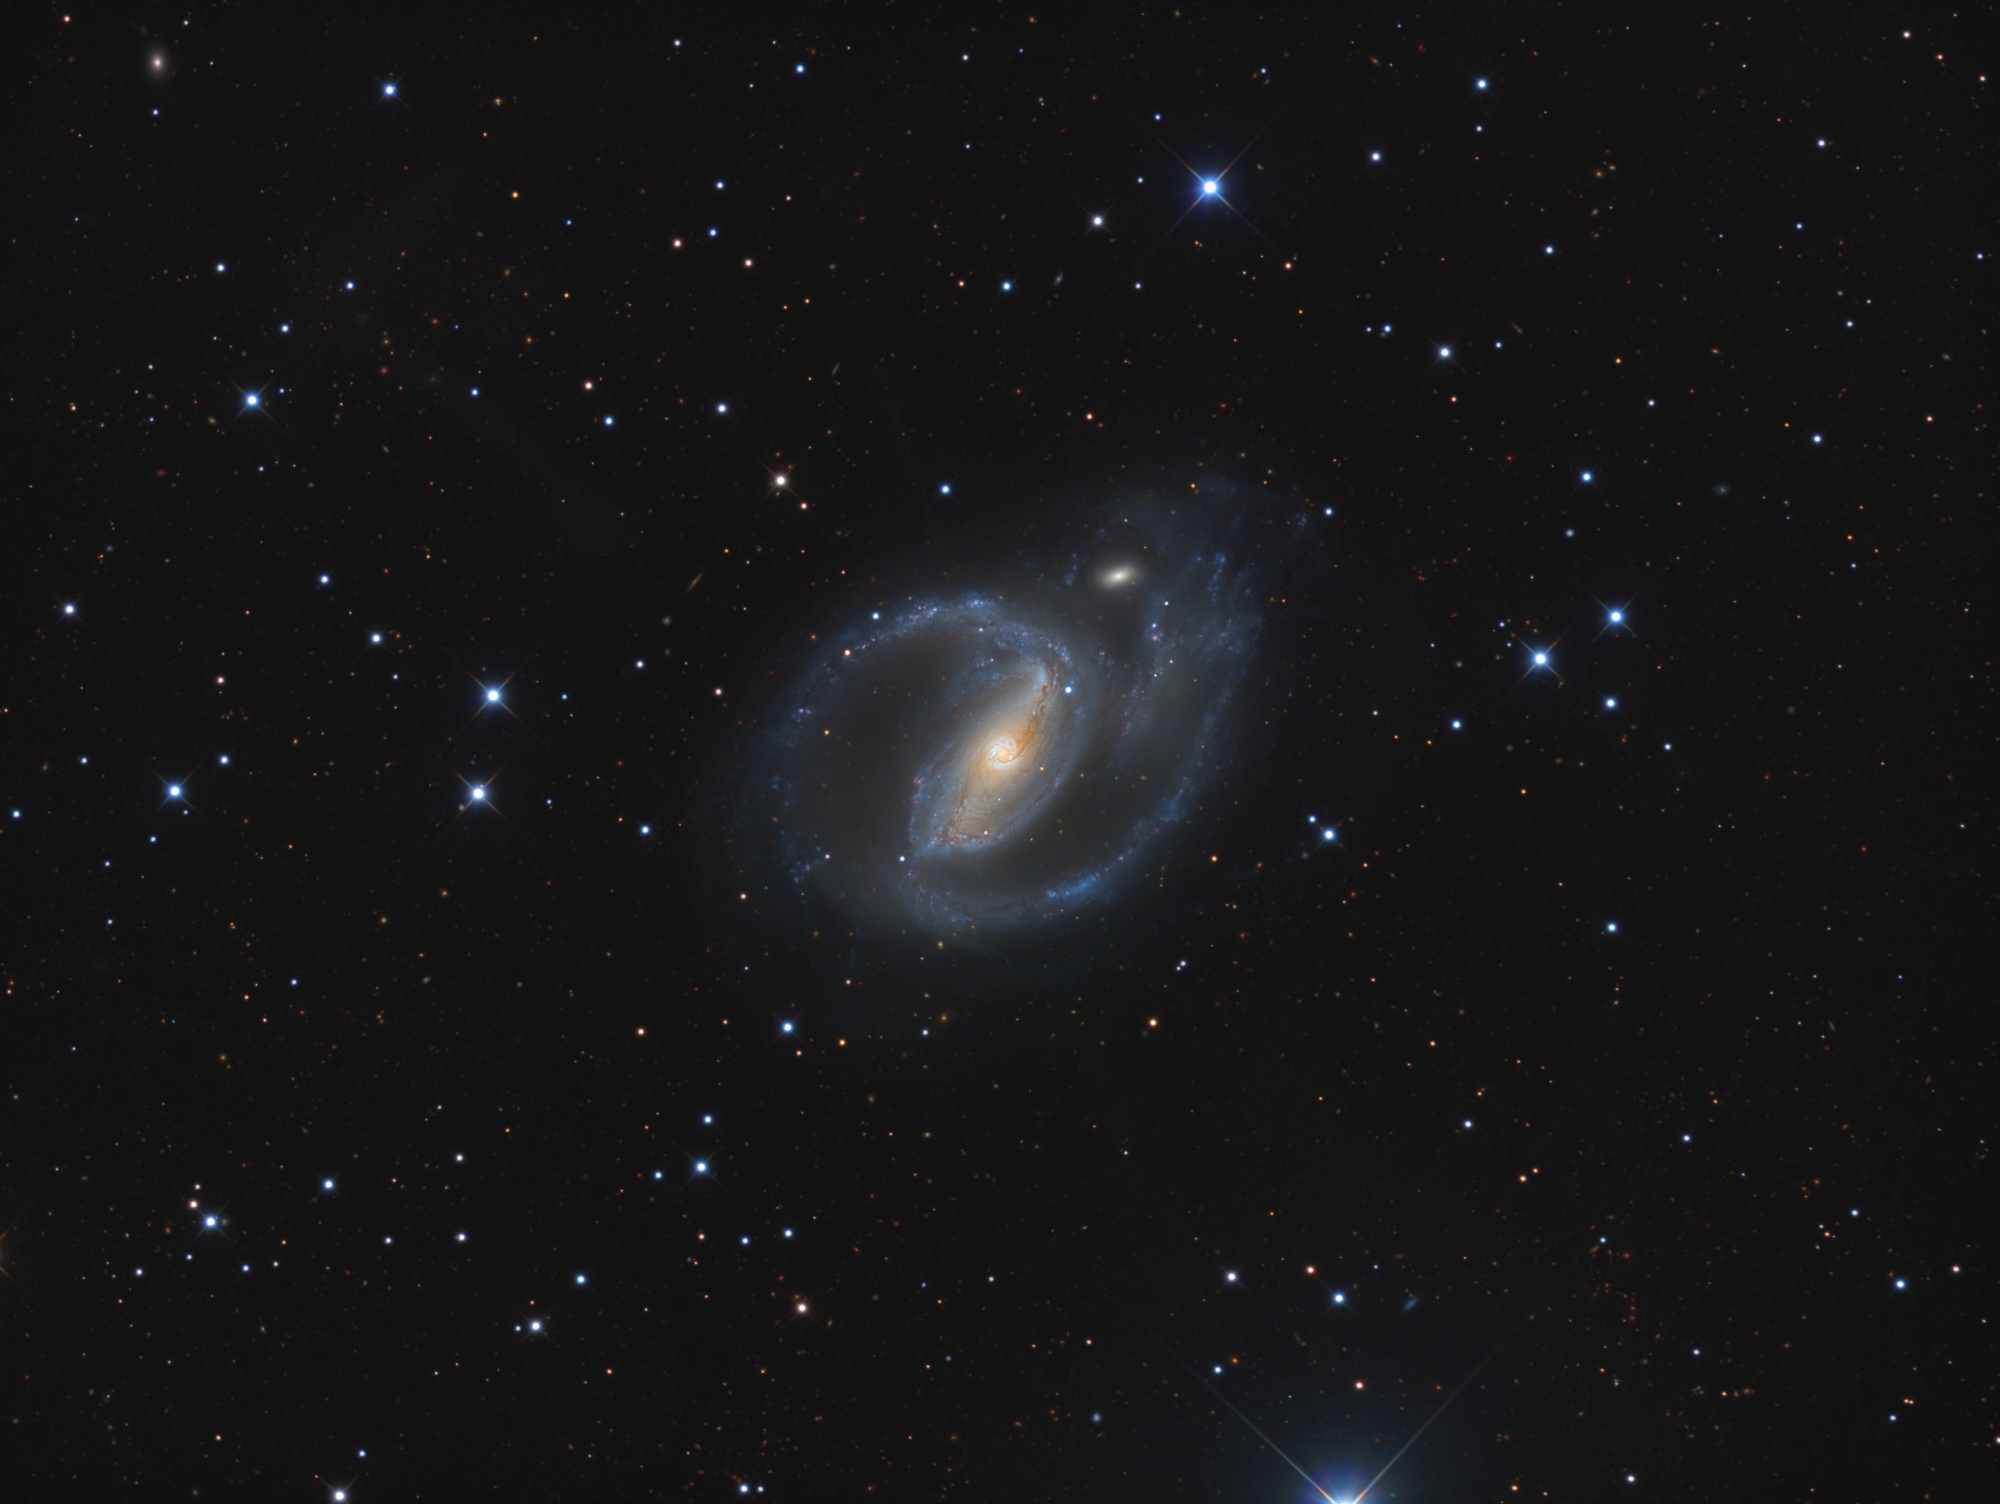 NGC1097-LRVB-V21-Publi.thumb.jpg.72f9f6be815aab019f0529e47d44834d.jpg